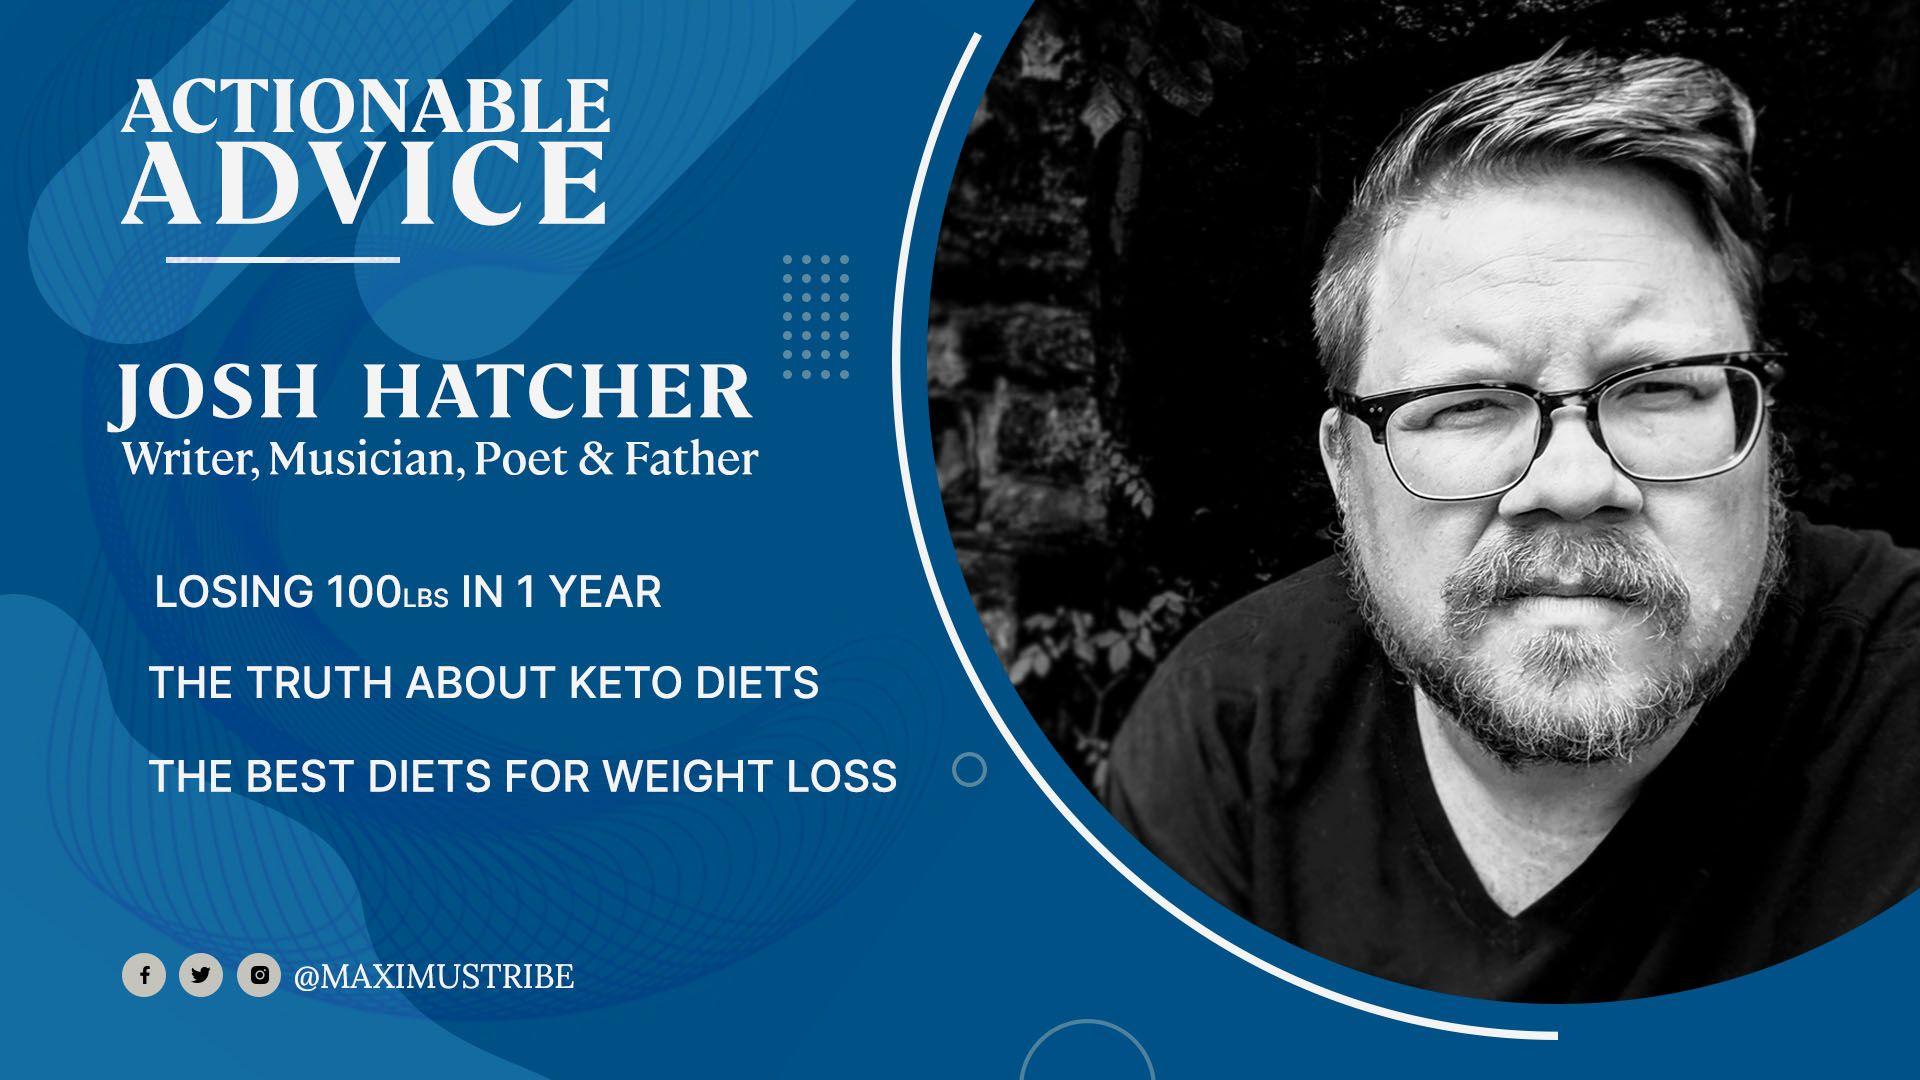 Actionable Advice: Josh Hatcher